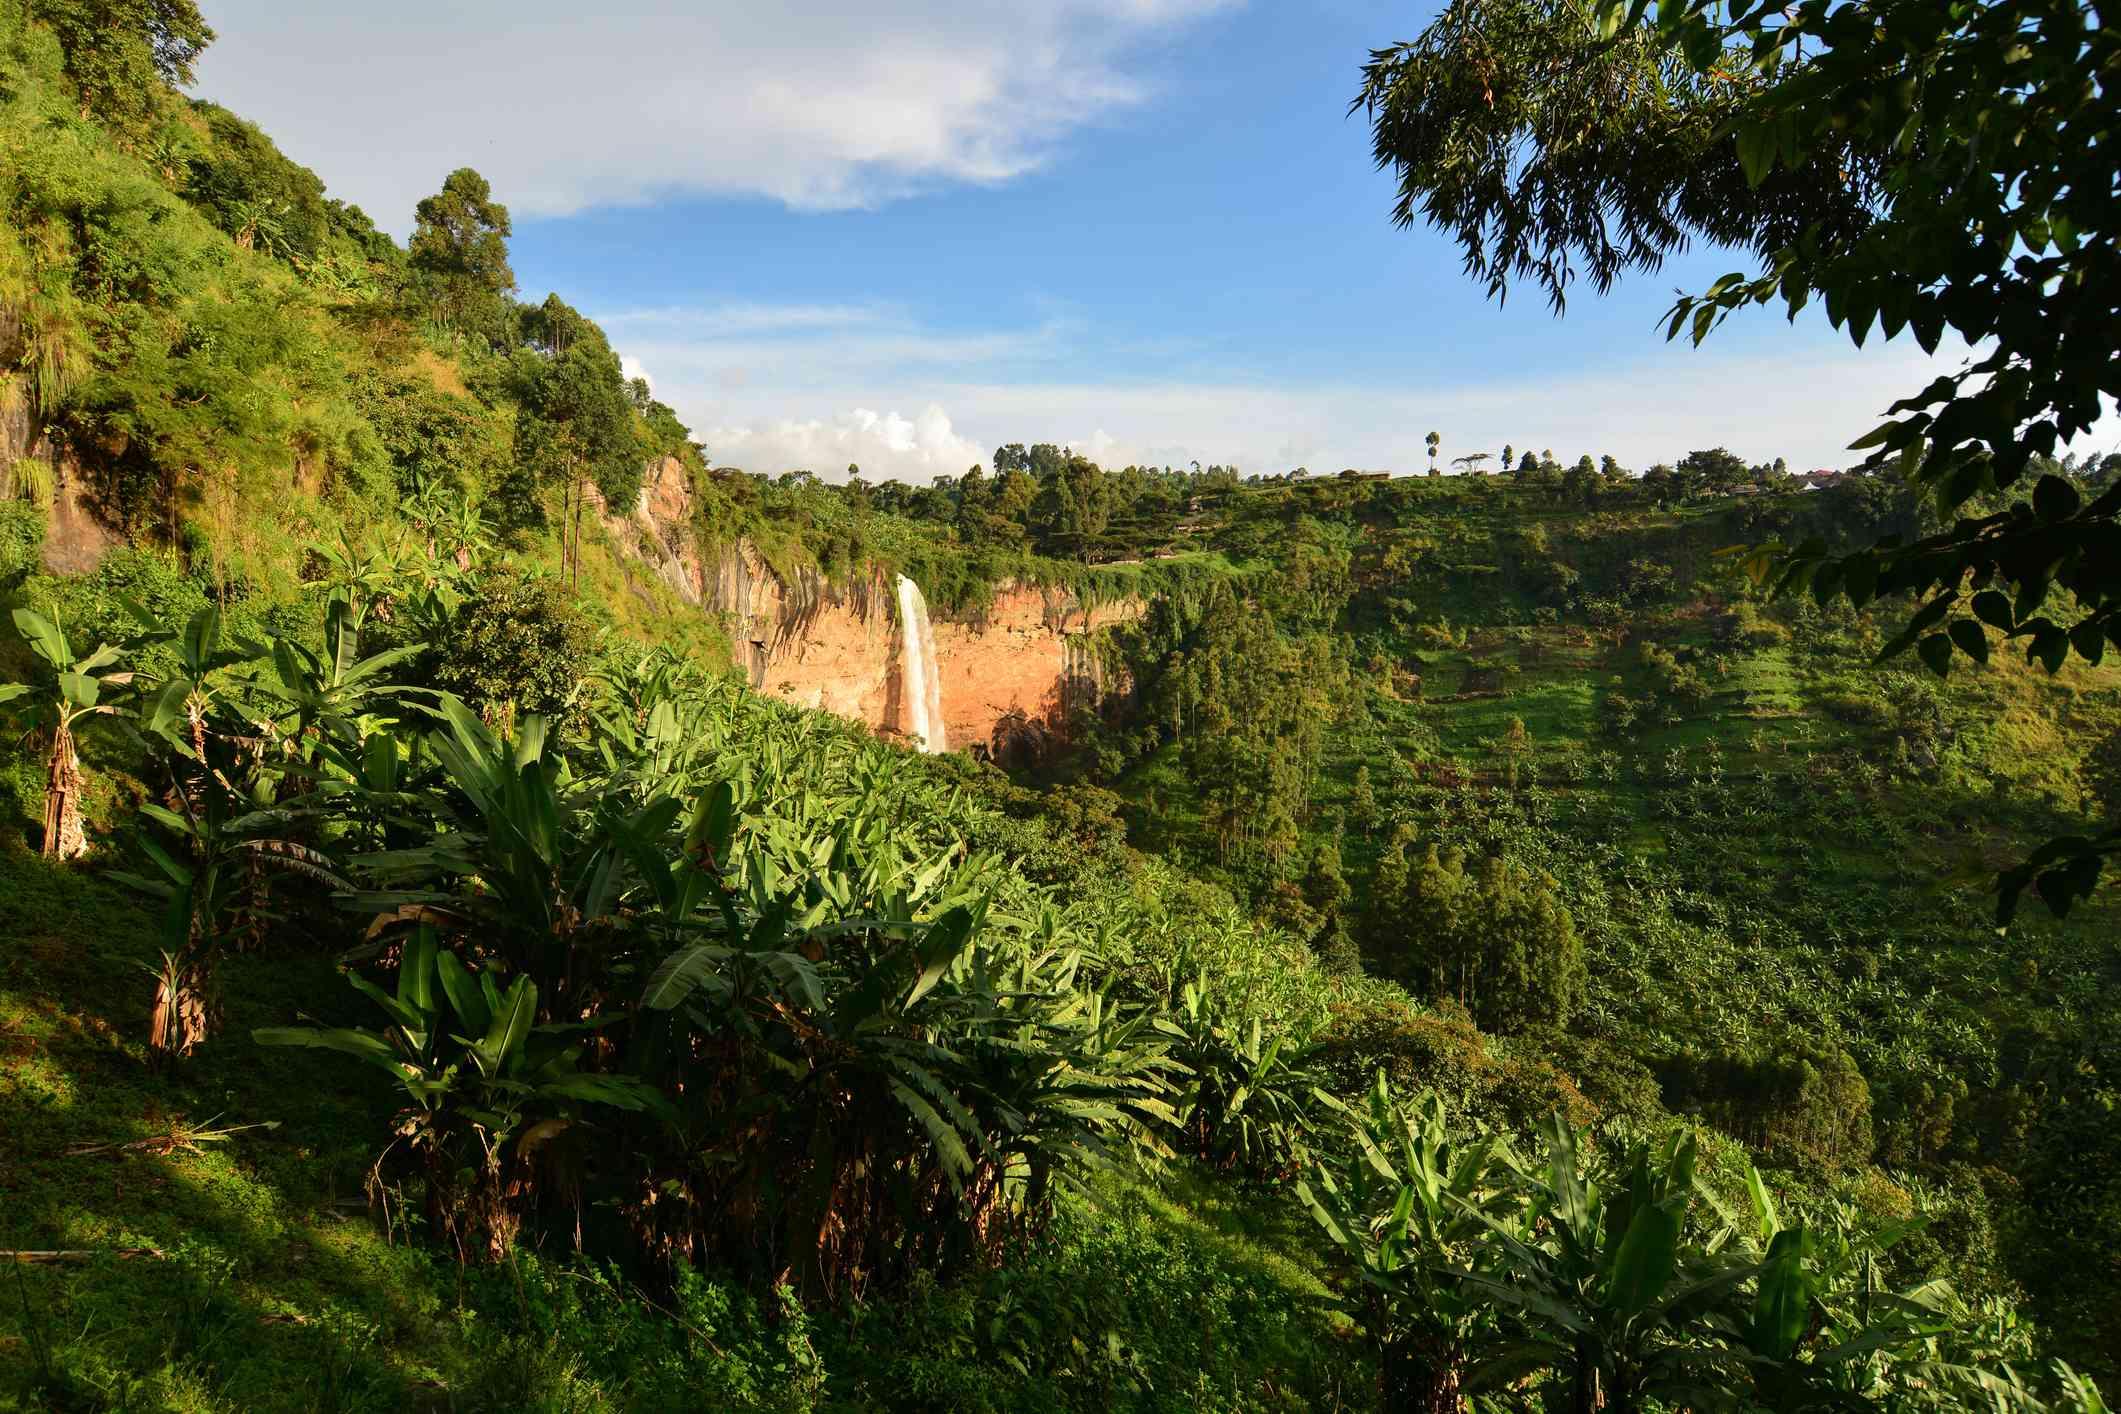 Waterfall in Mount Elgon National Park, Uganda